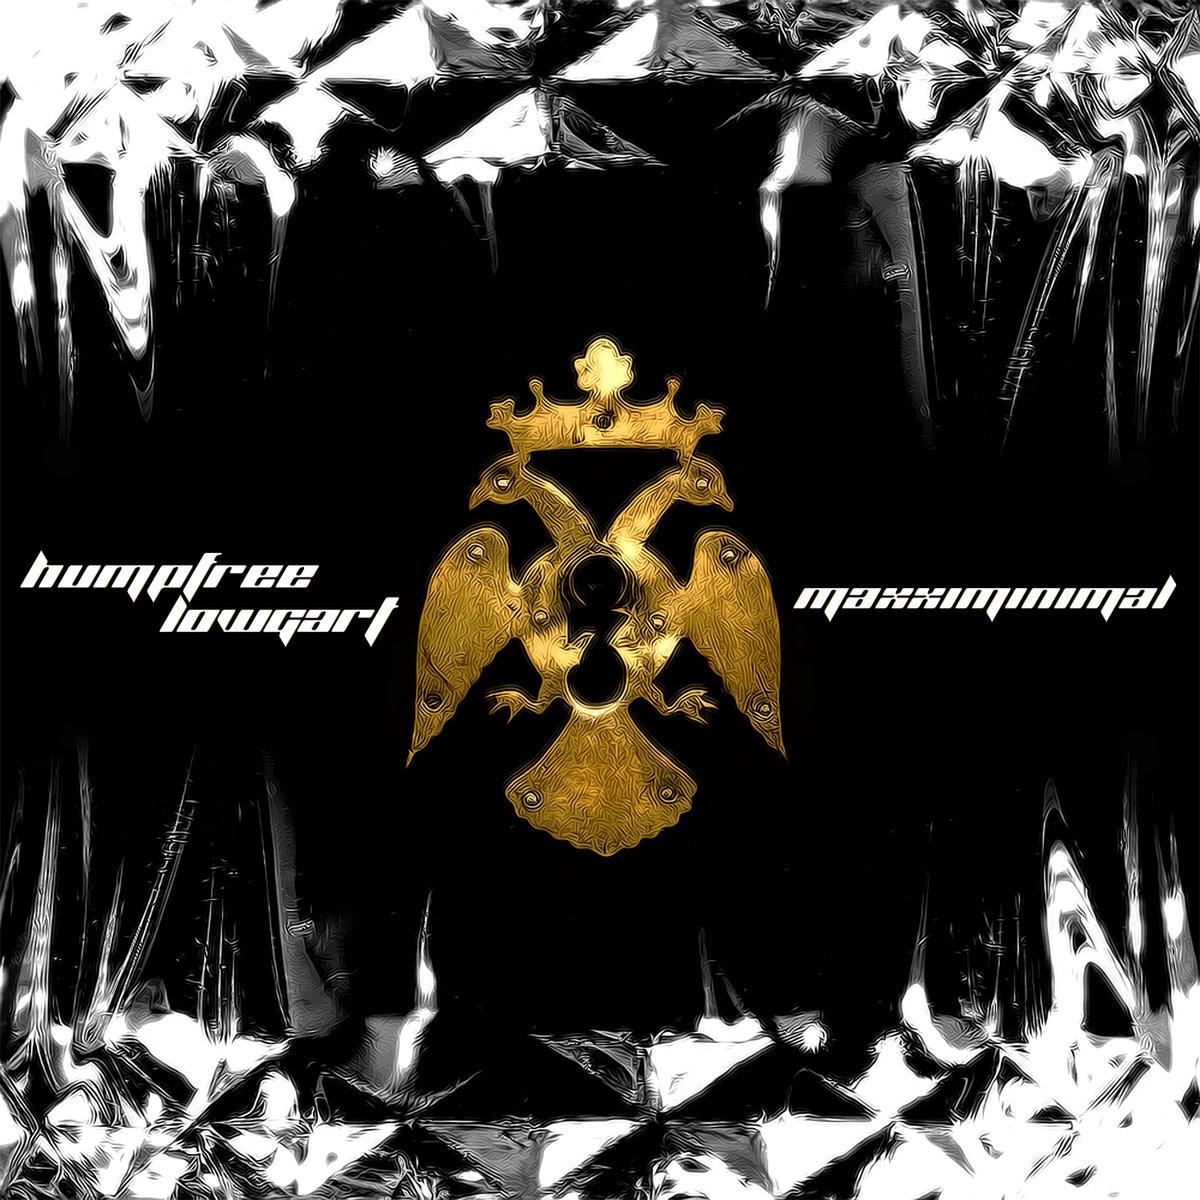 Humpfree LowGart - Abrasionism @ 'Maxximinimal' album (bass, chill)